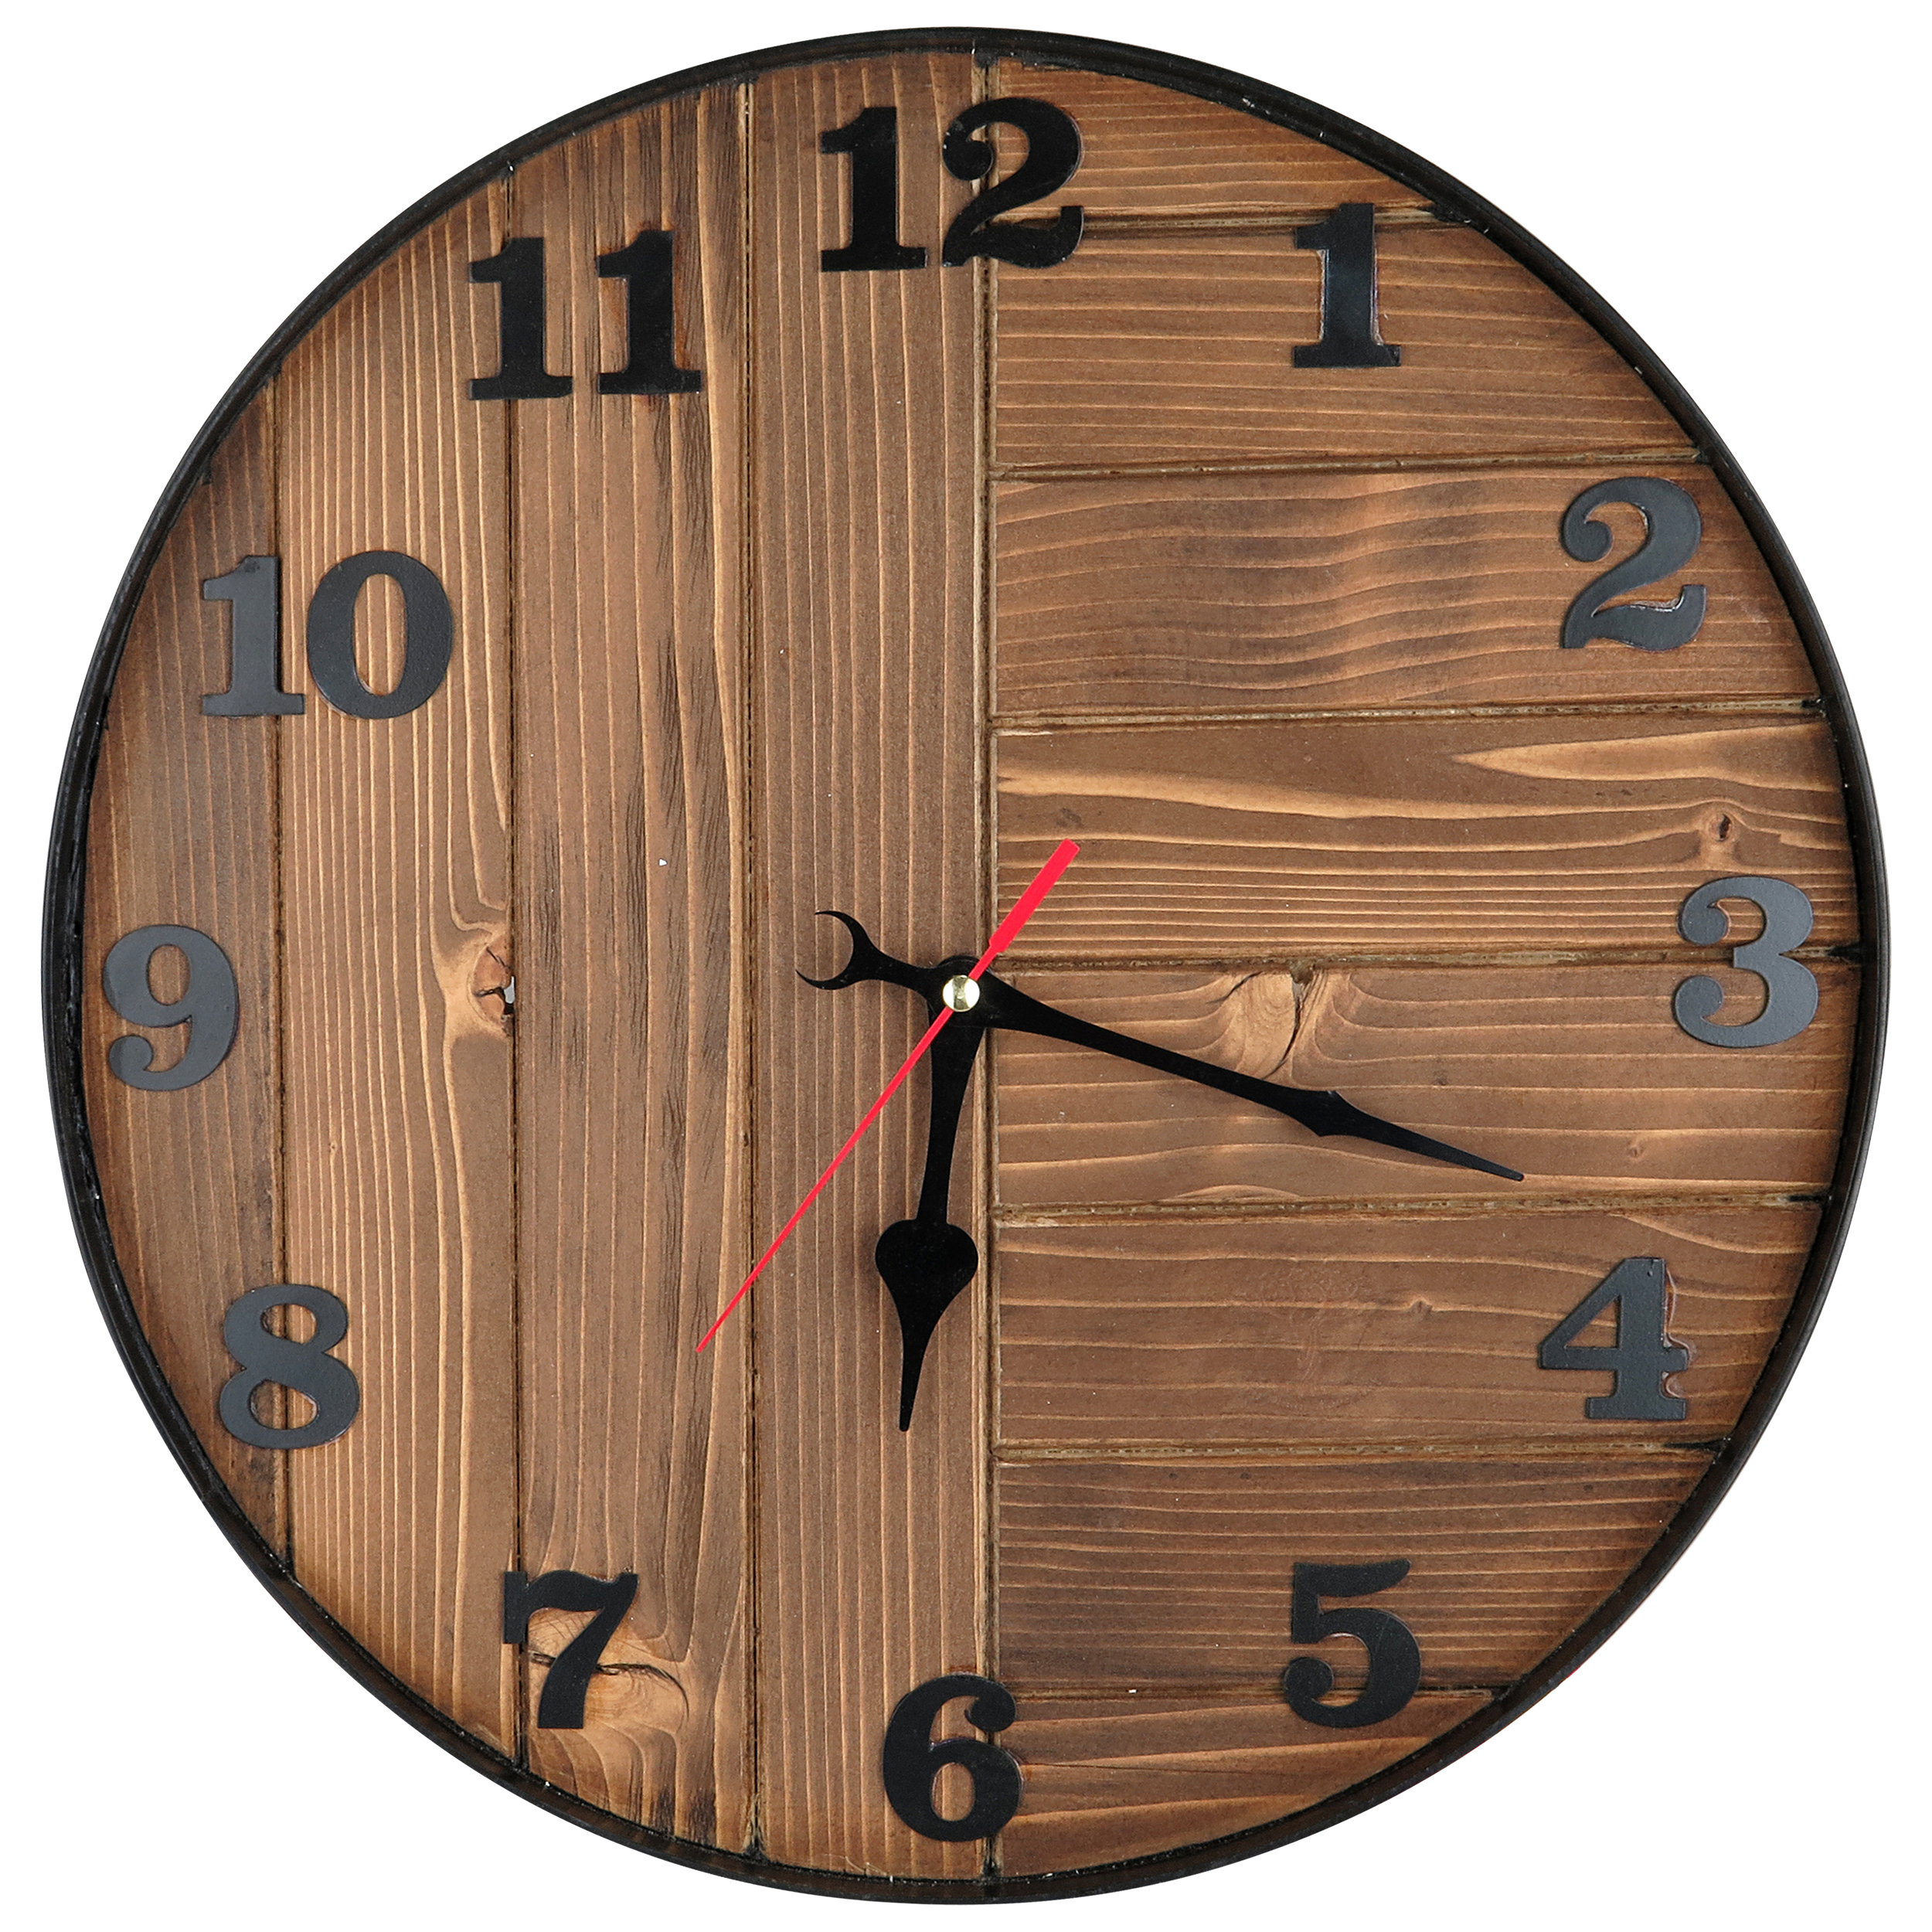 ساعت دیواری چوبی آباج کد BROWN40